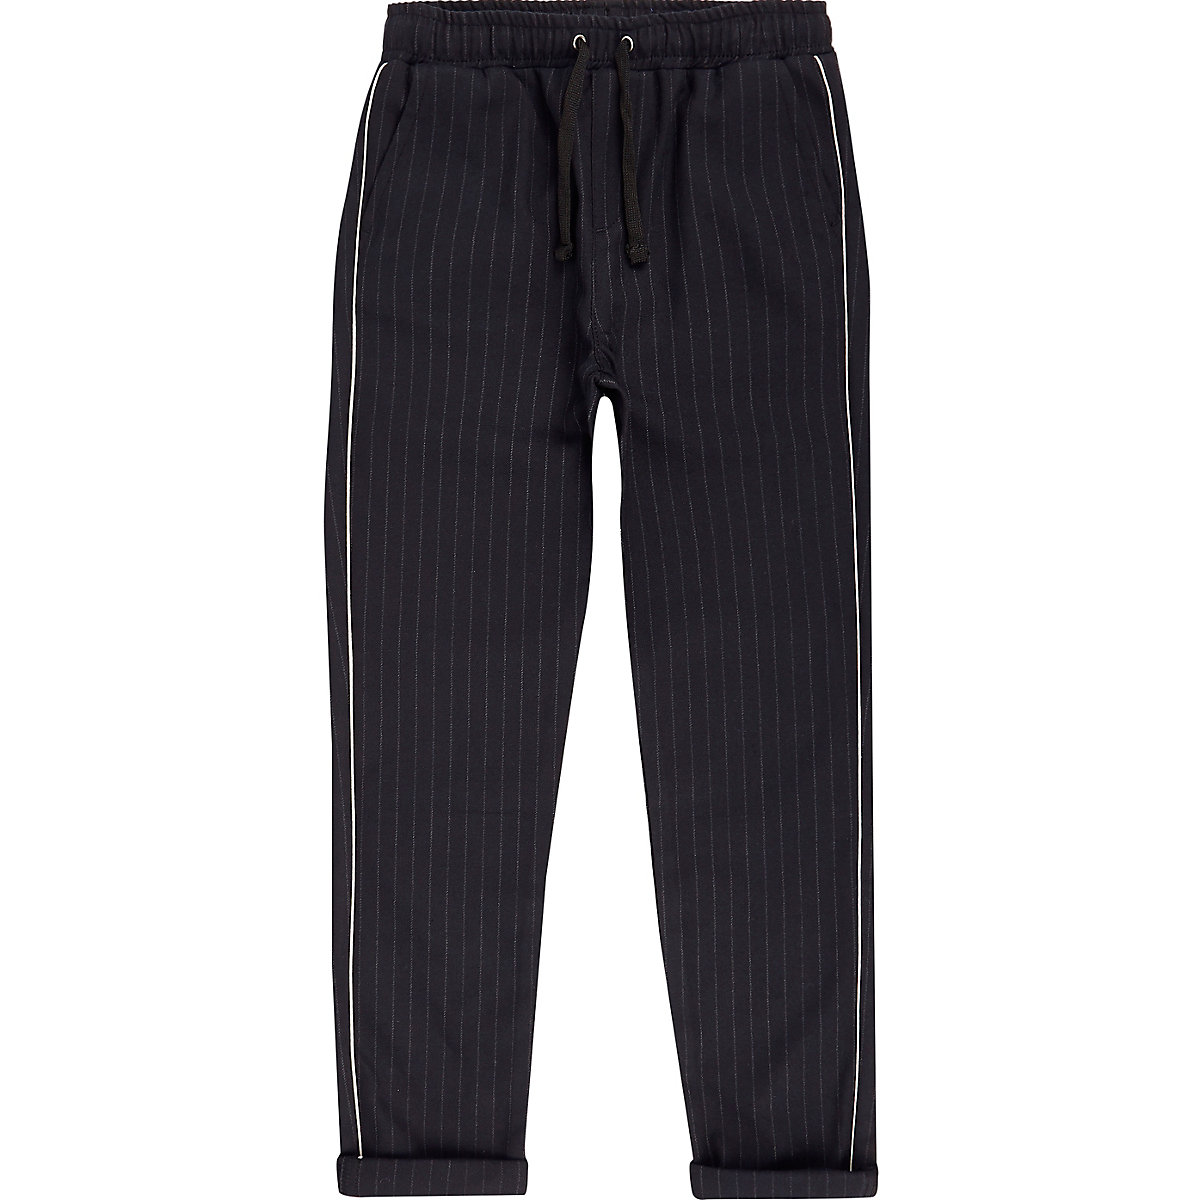 Boys navy pinstripe tape pants